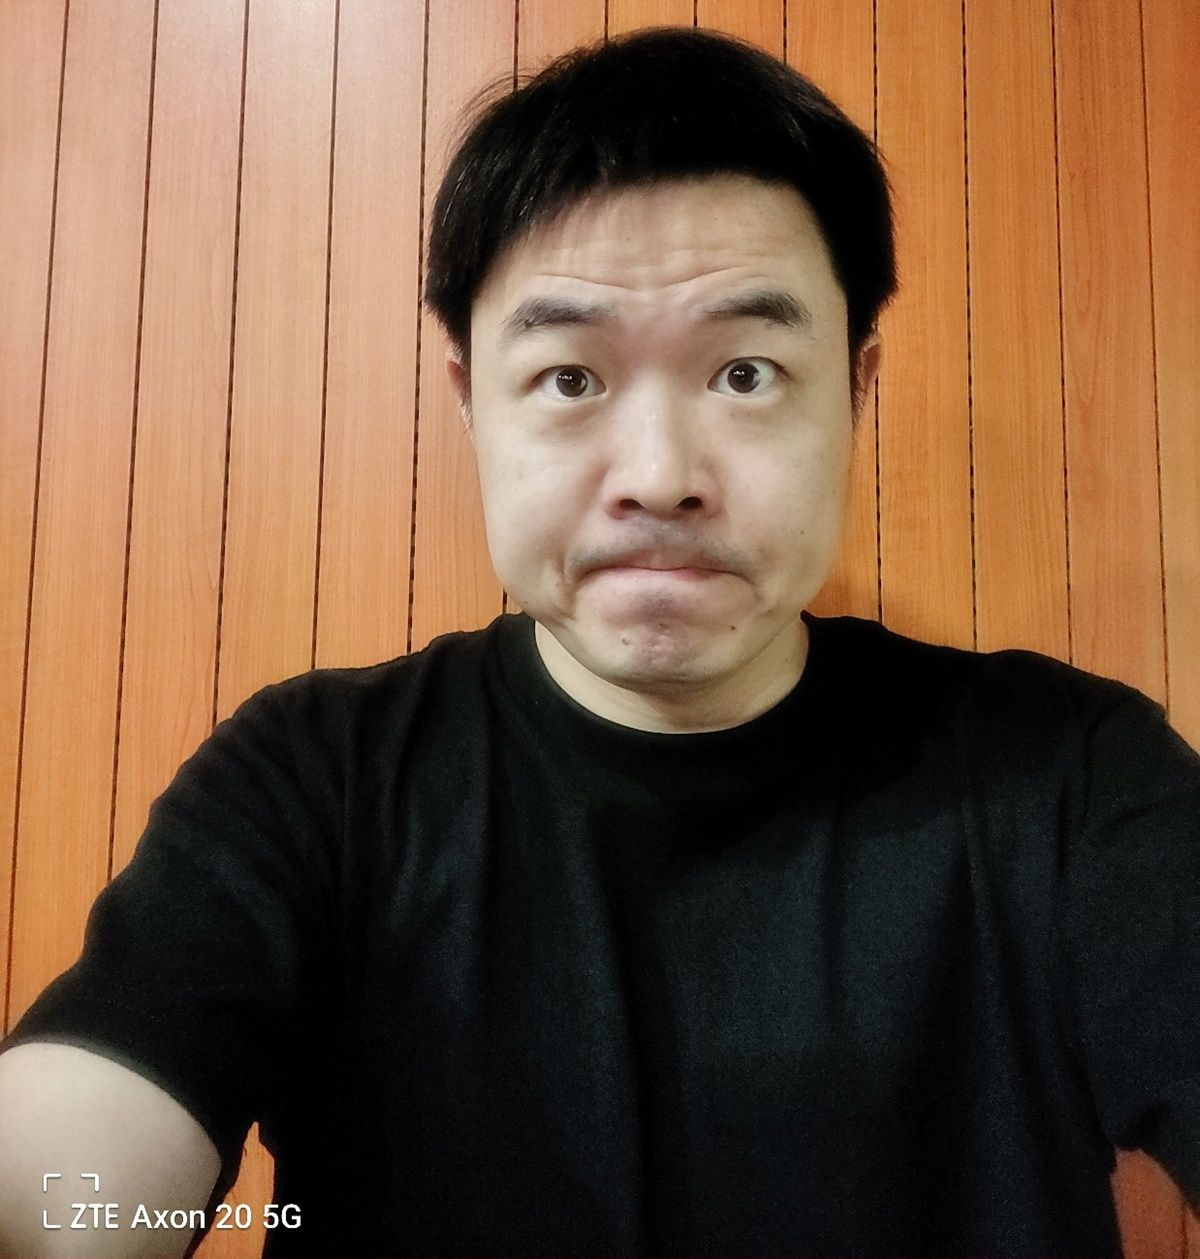 camara selfie debajo de la pantalla zte axon 20 5g